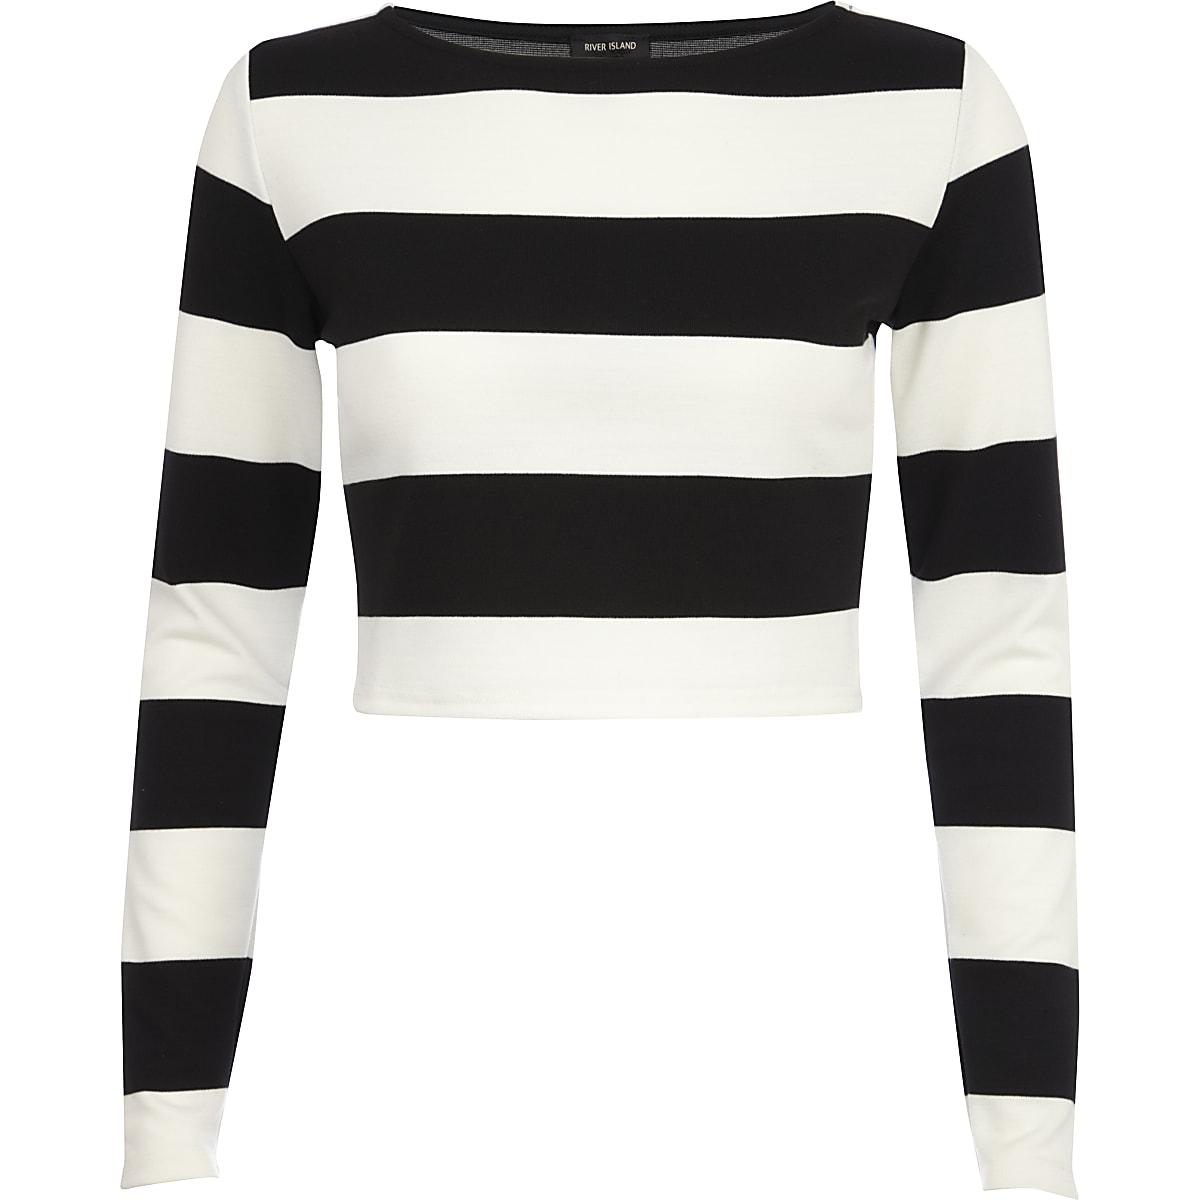 6f8ea199ac9b Black and white chunky stripe crop top - Crop Tops   Bralets - Tops ...